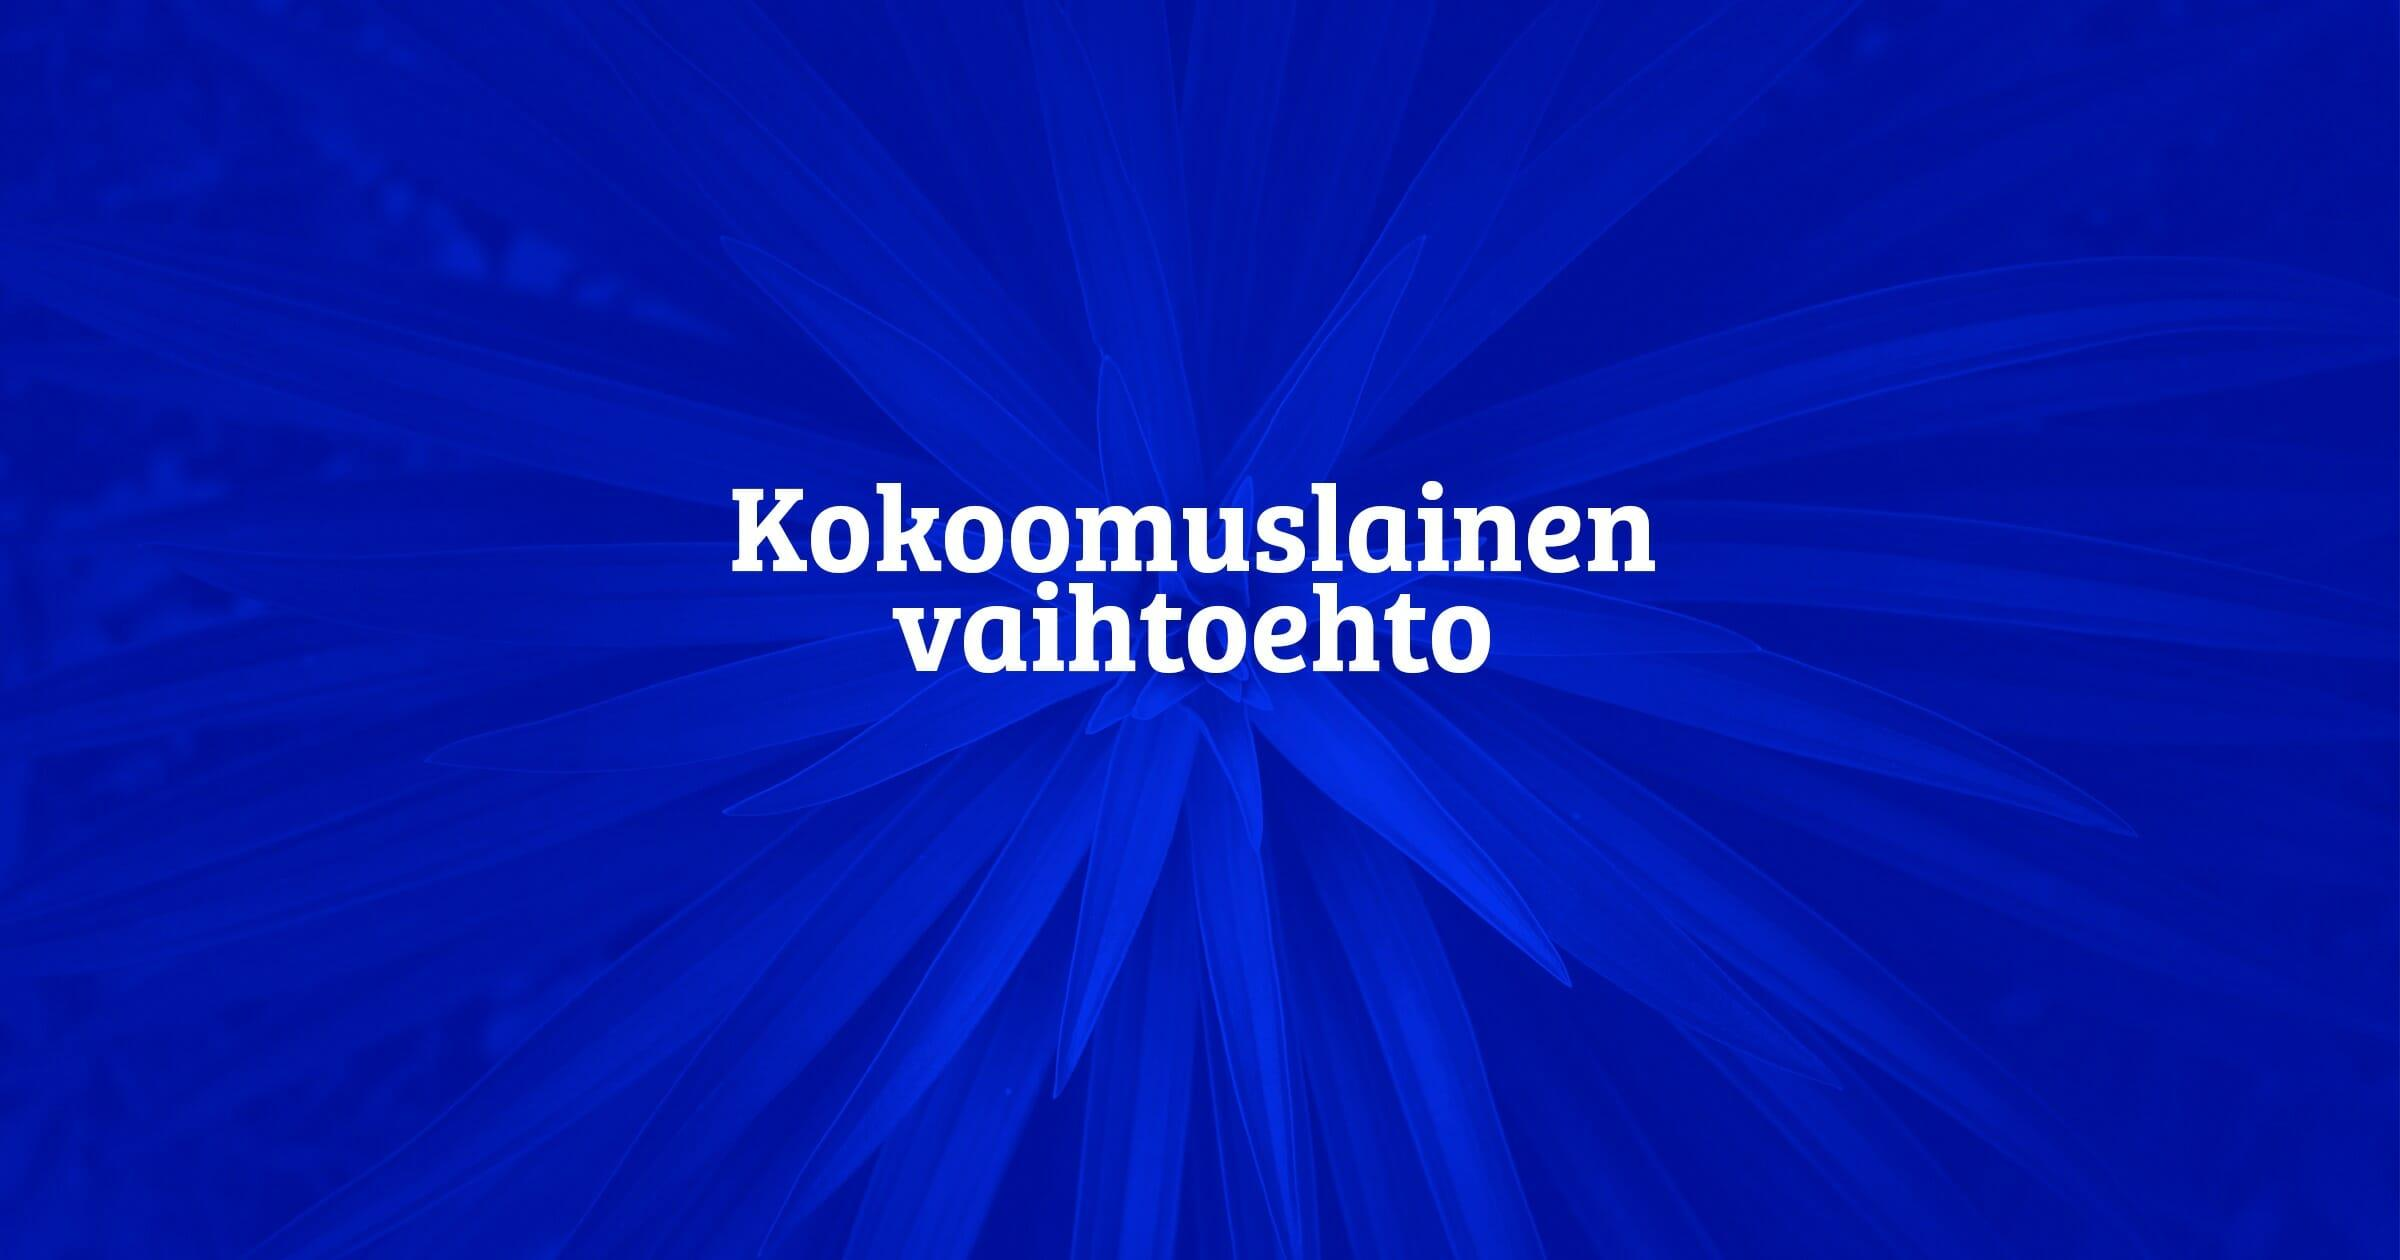 www.kokoomus.fi